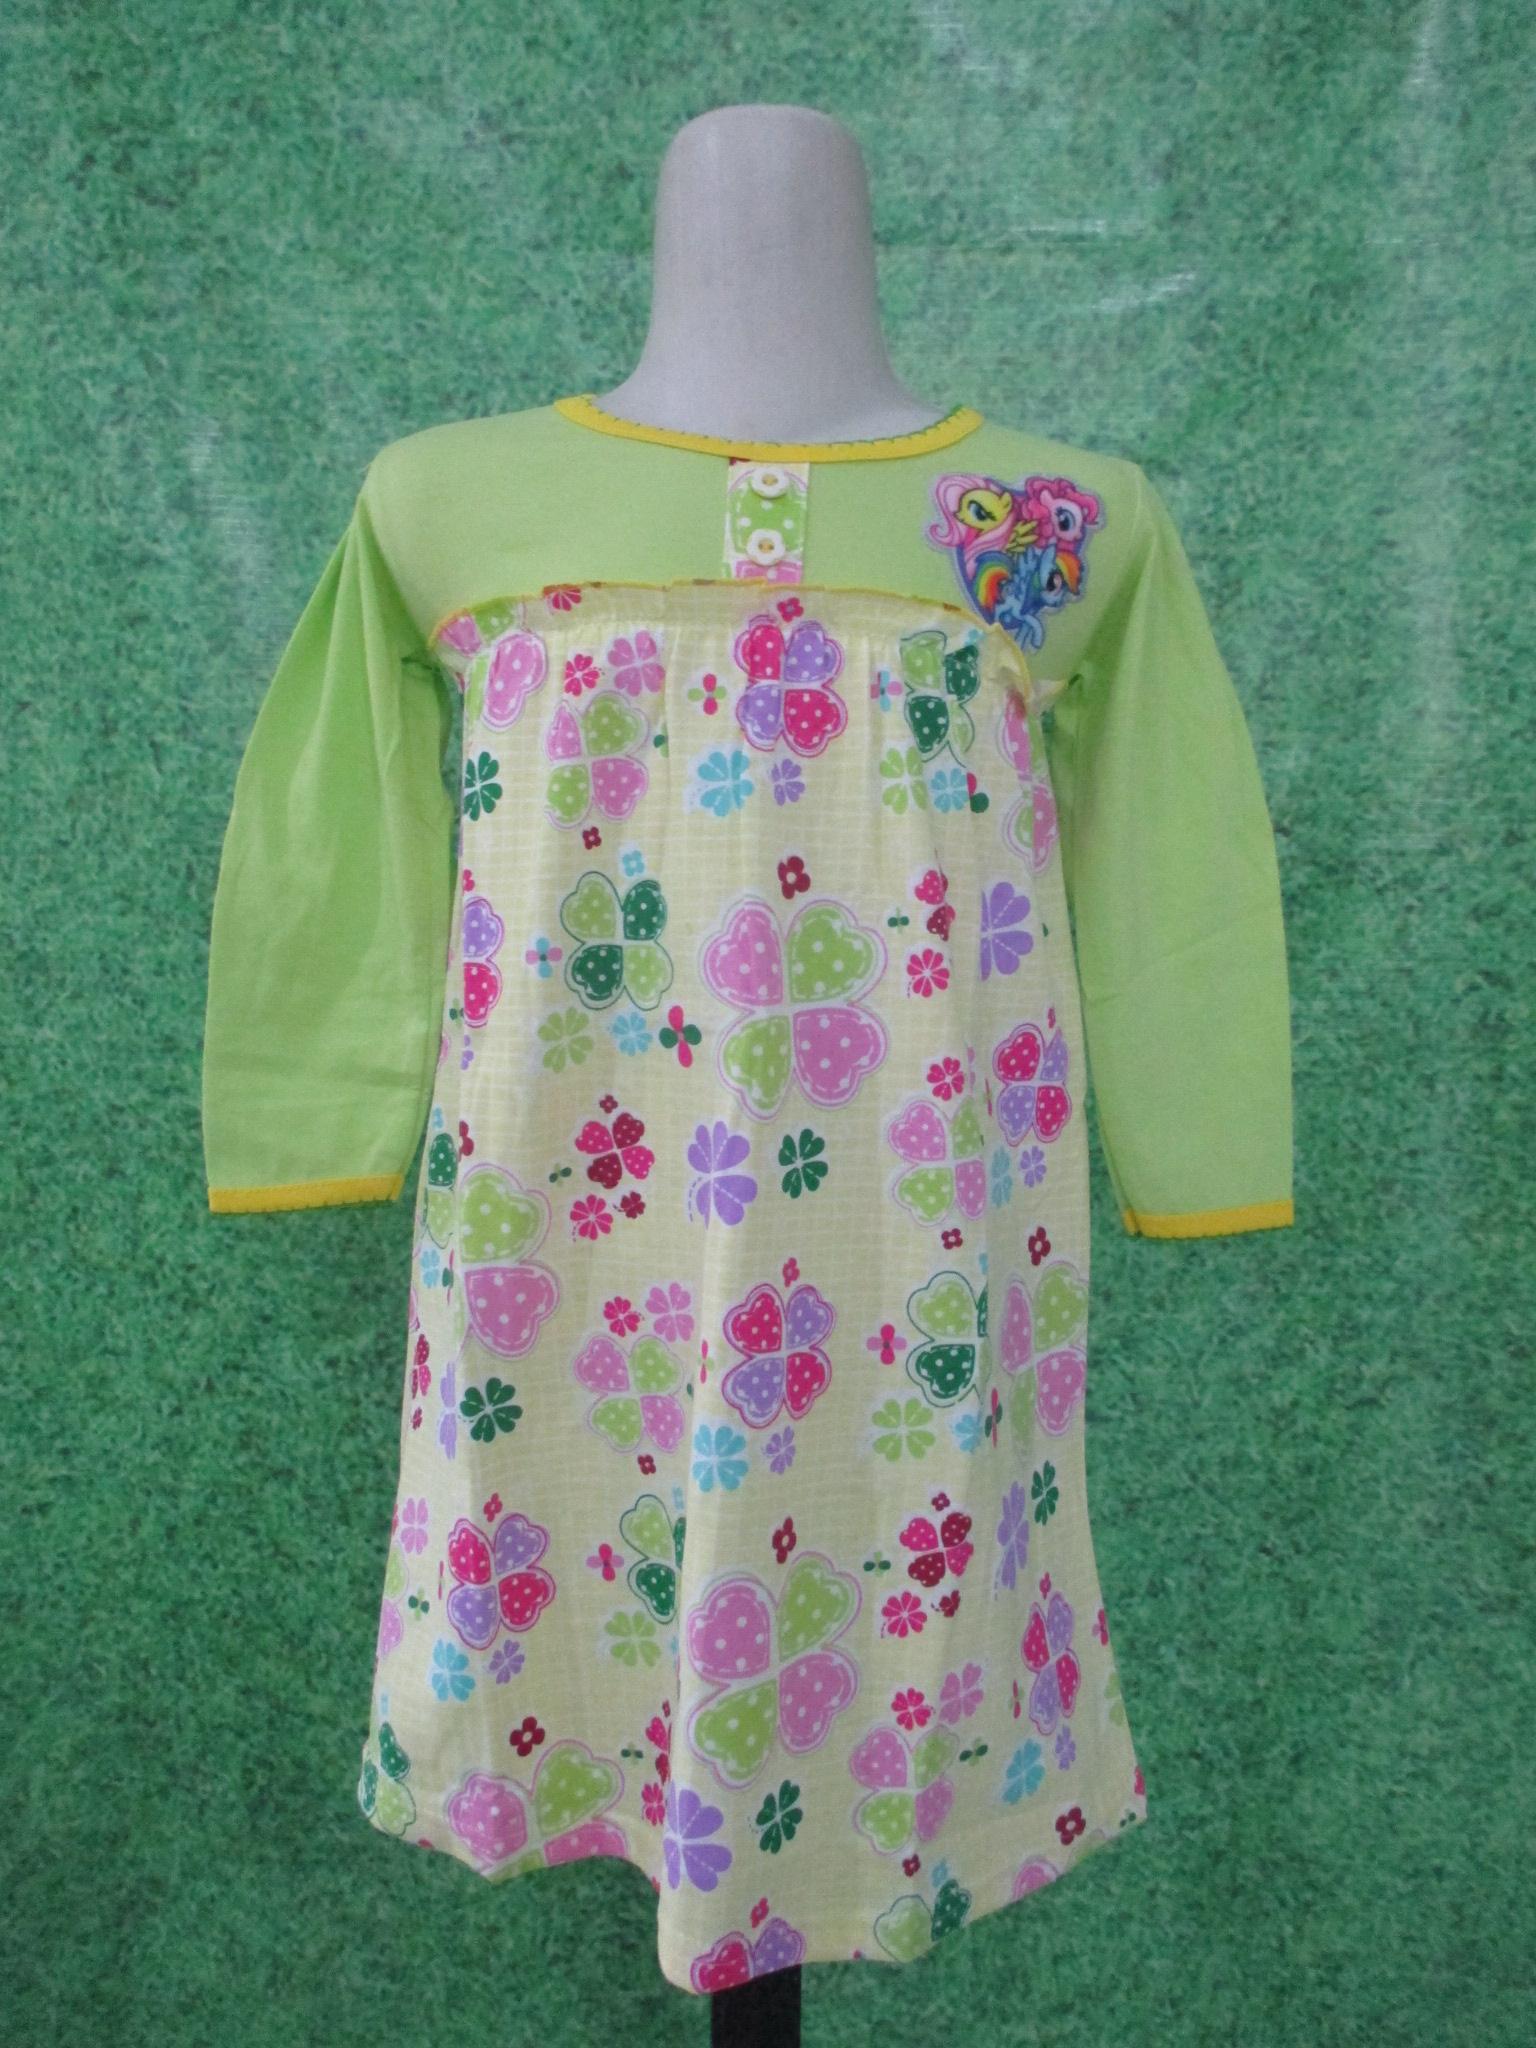 ObralanBaju.com Dress V3